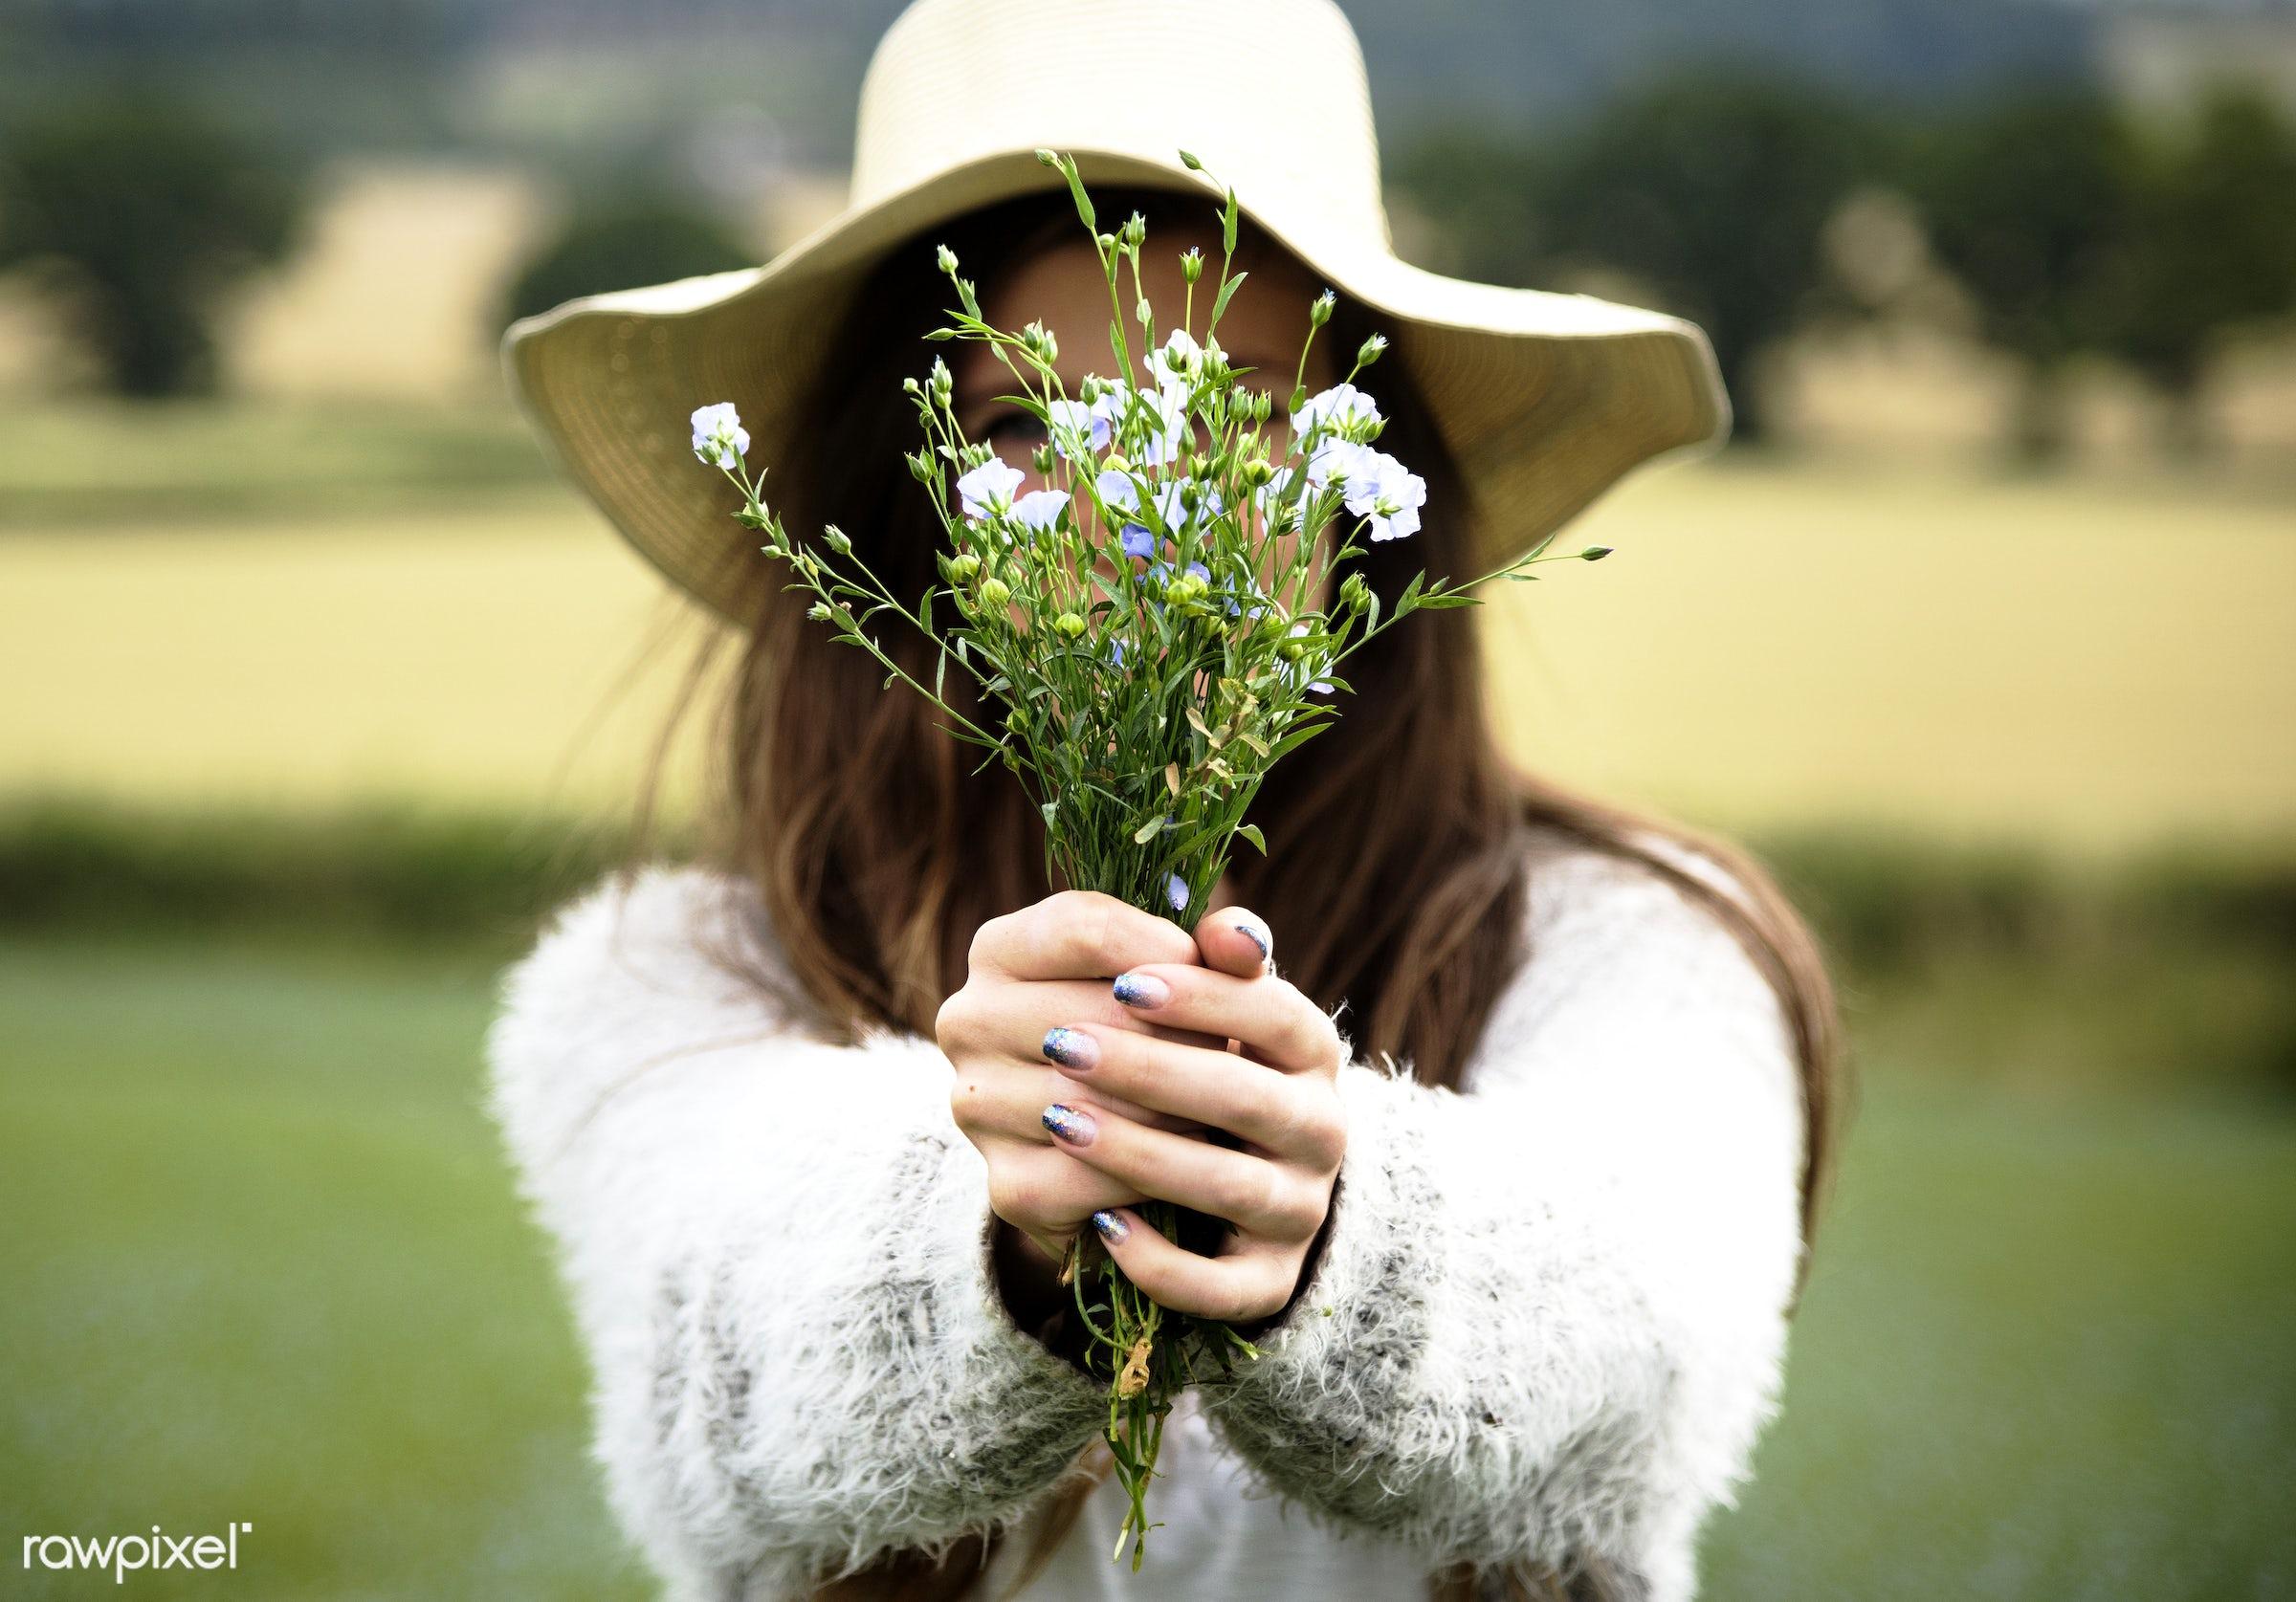 Woman and flowers - alone, bloom, botanical, botany, countryside, field, flora, flowers, fresh, garden, gardener, gardening...